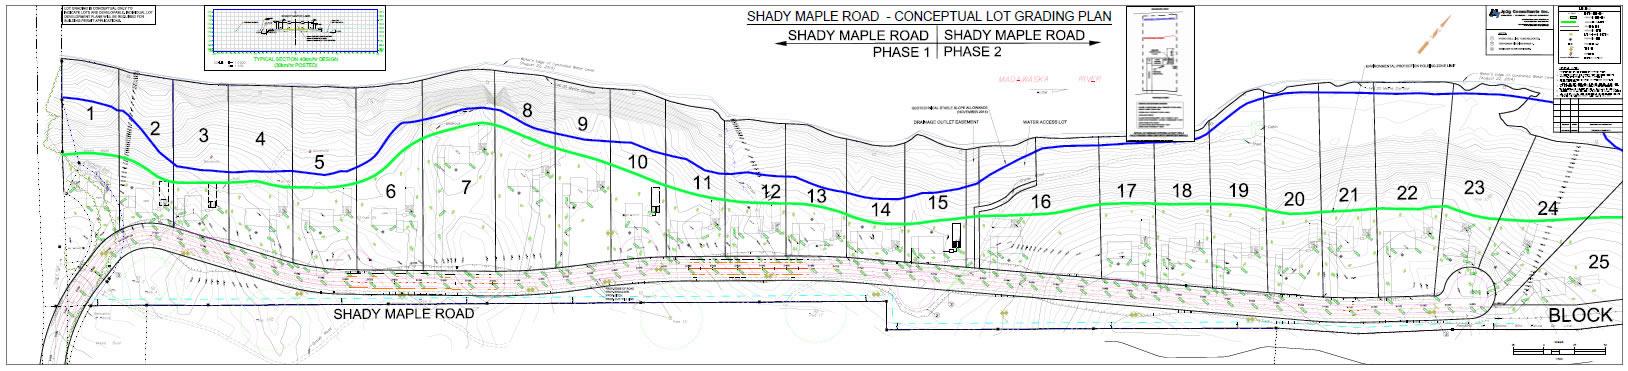 Waterfront lot division for the Braeburn Estates